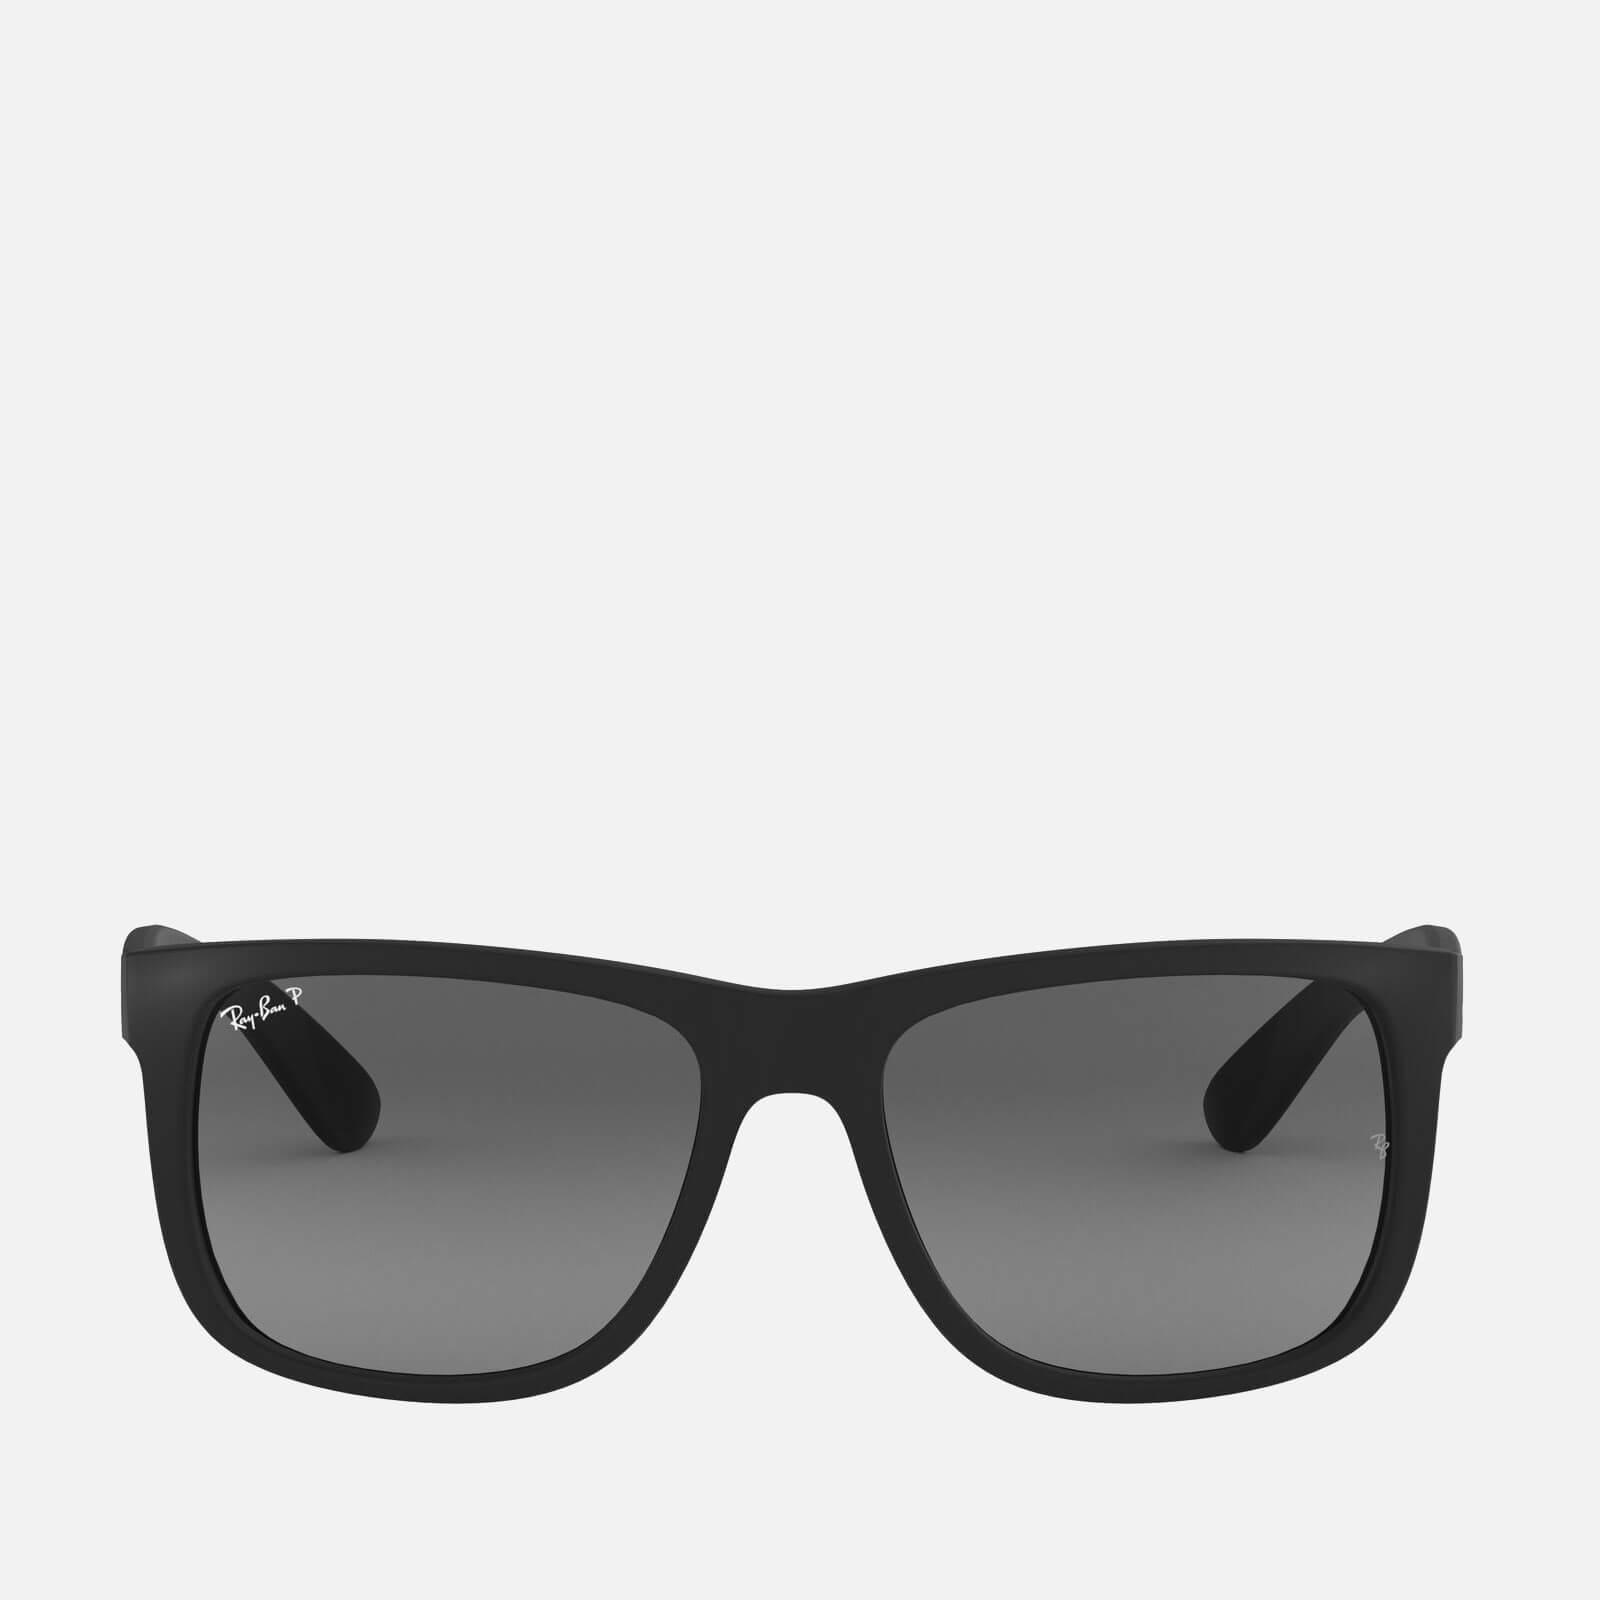 Ray Ban Women's Justin Men's acetate sunglasses - Black